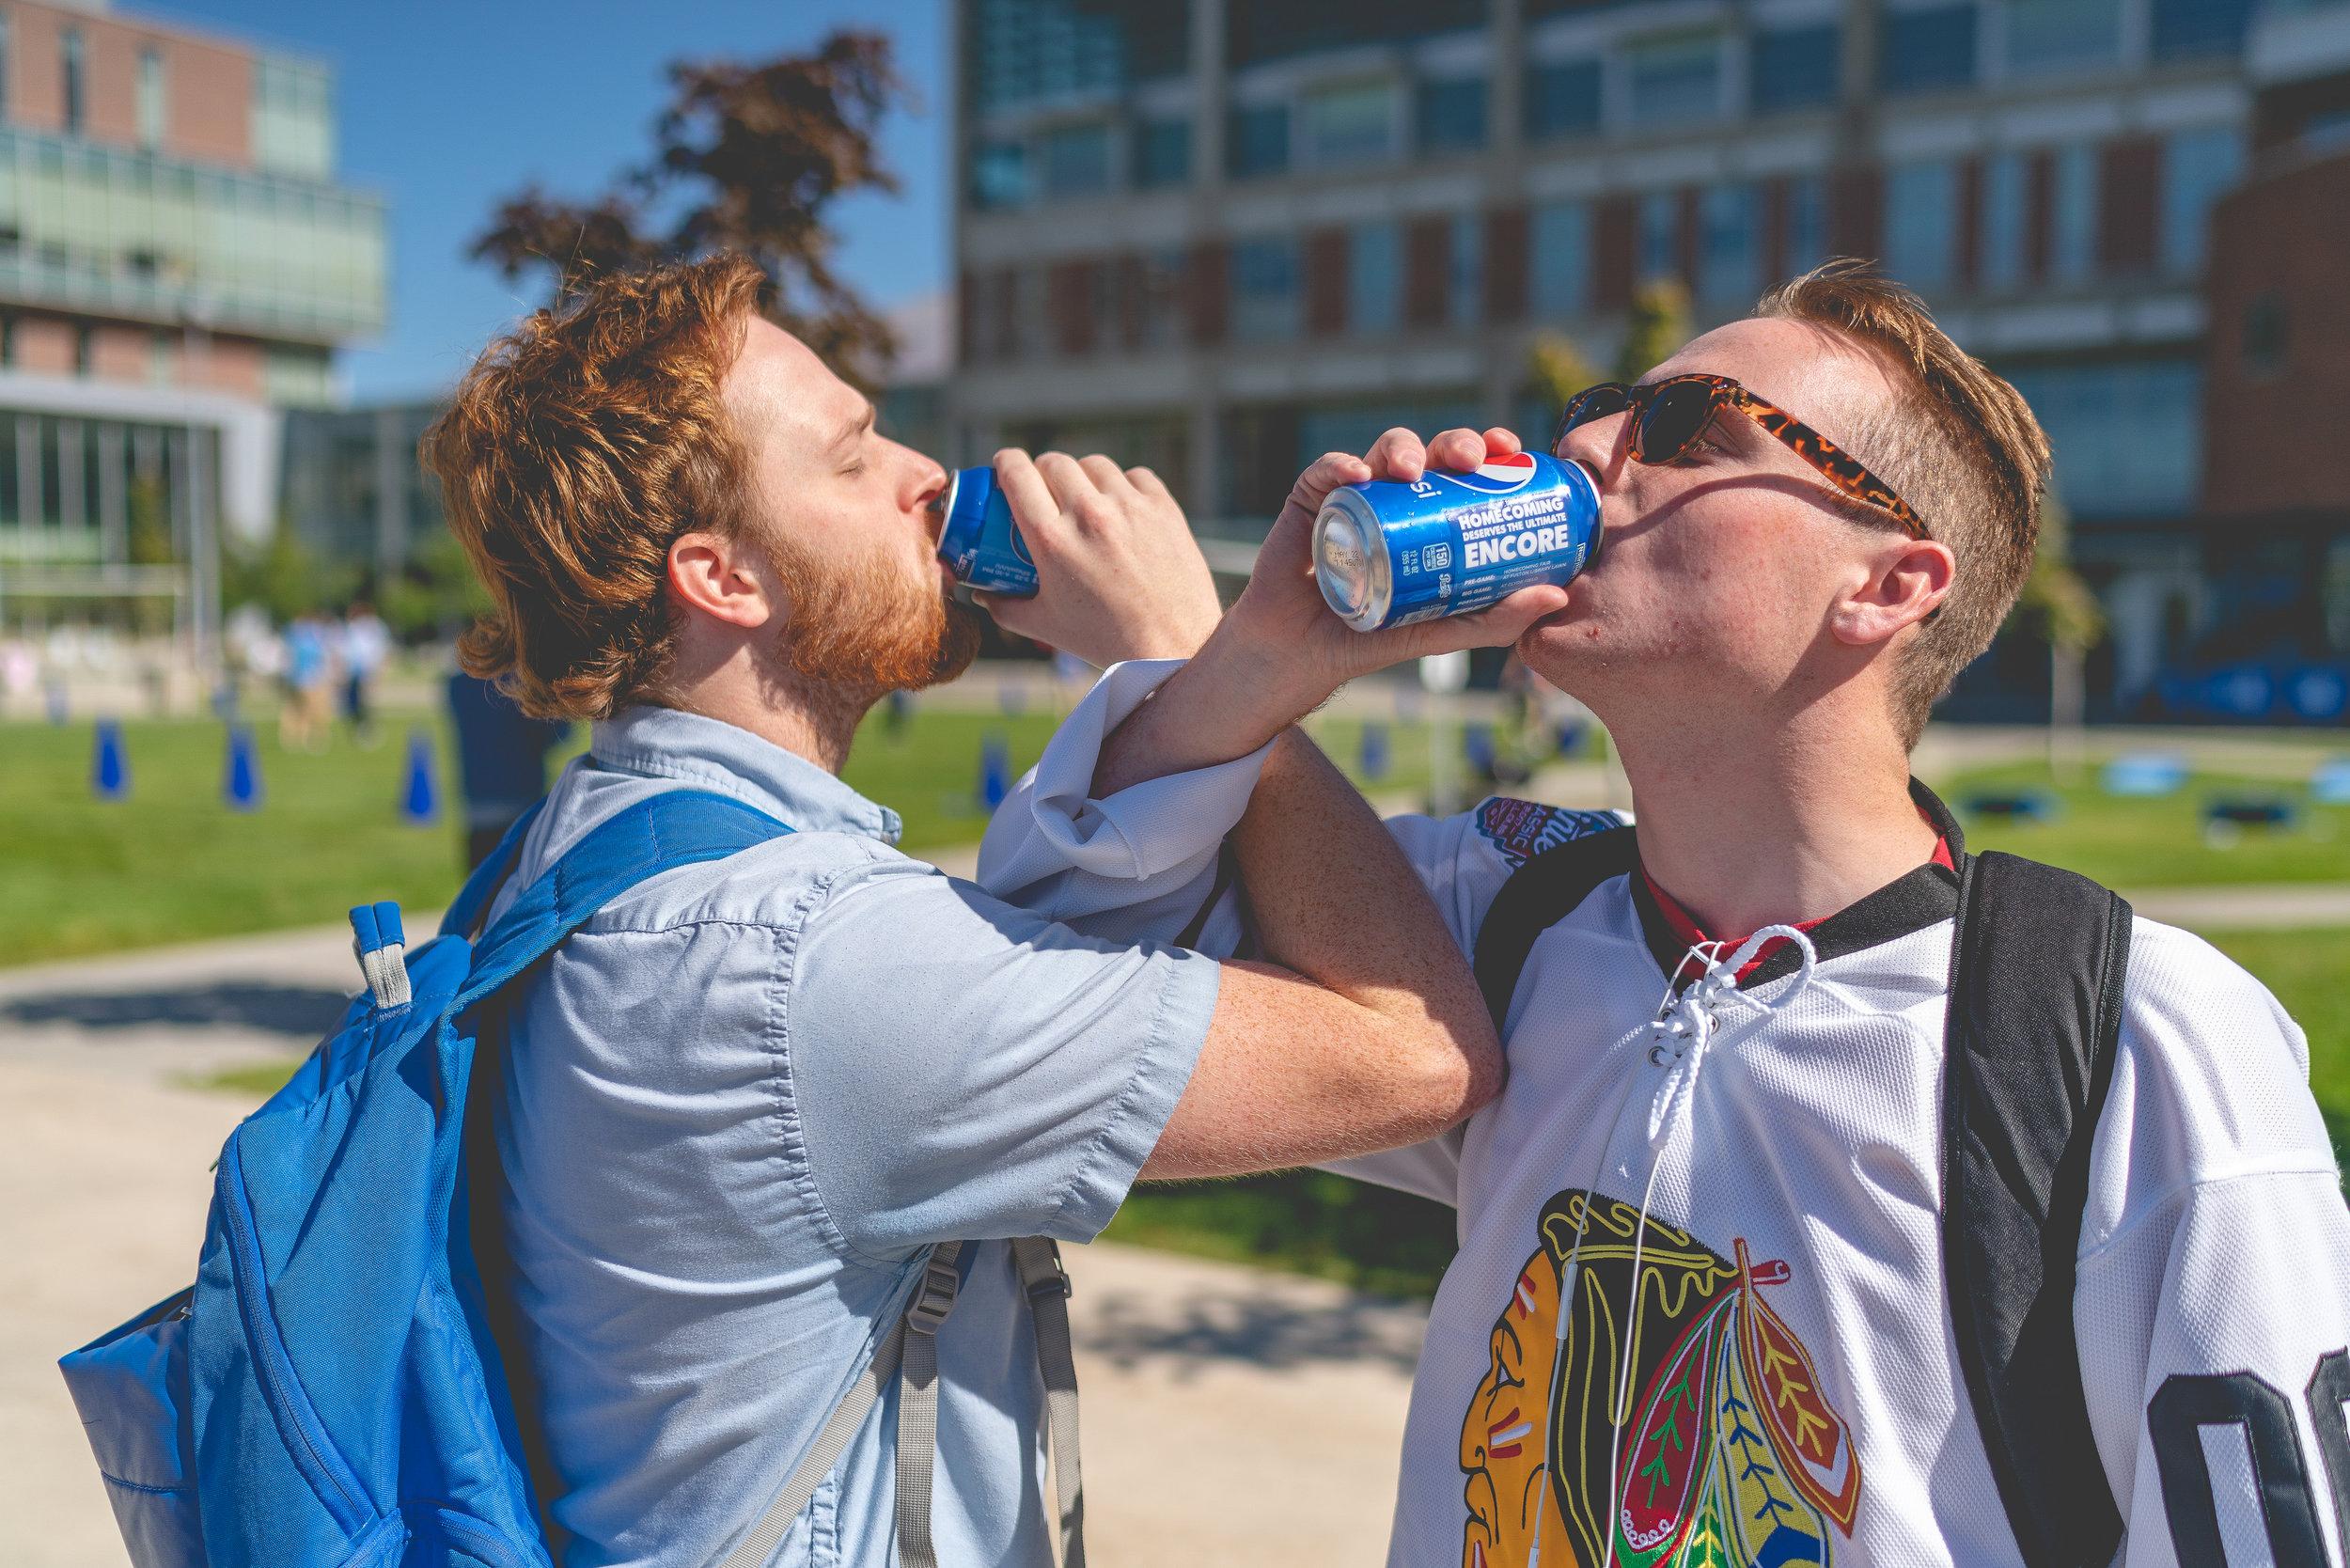 OHelloMedia-Pepsi-UVUHomecoming-9.28-183.jpg